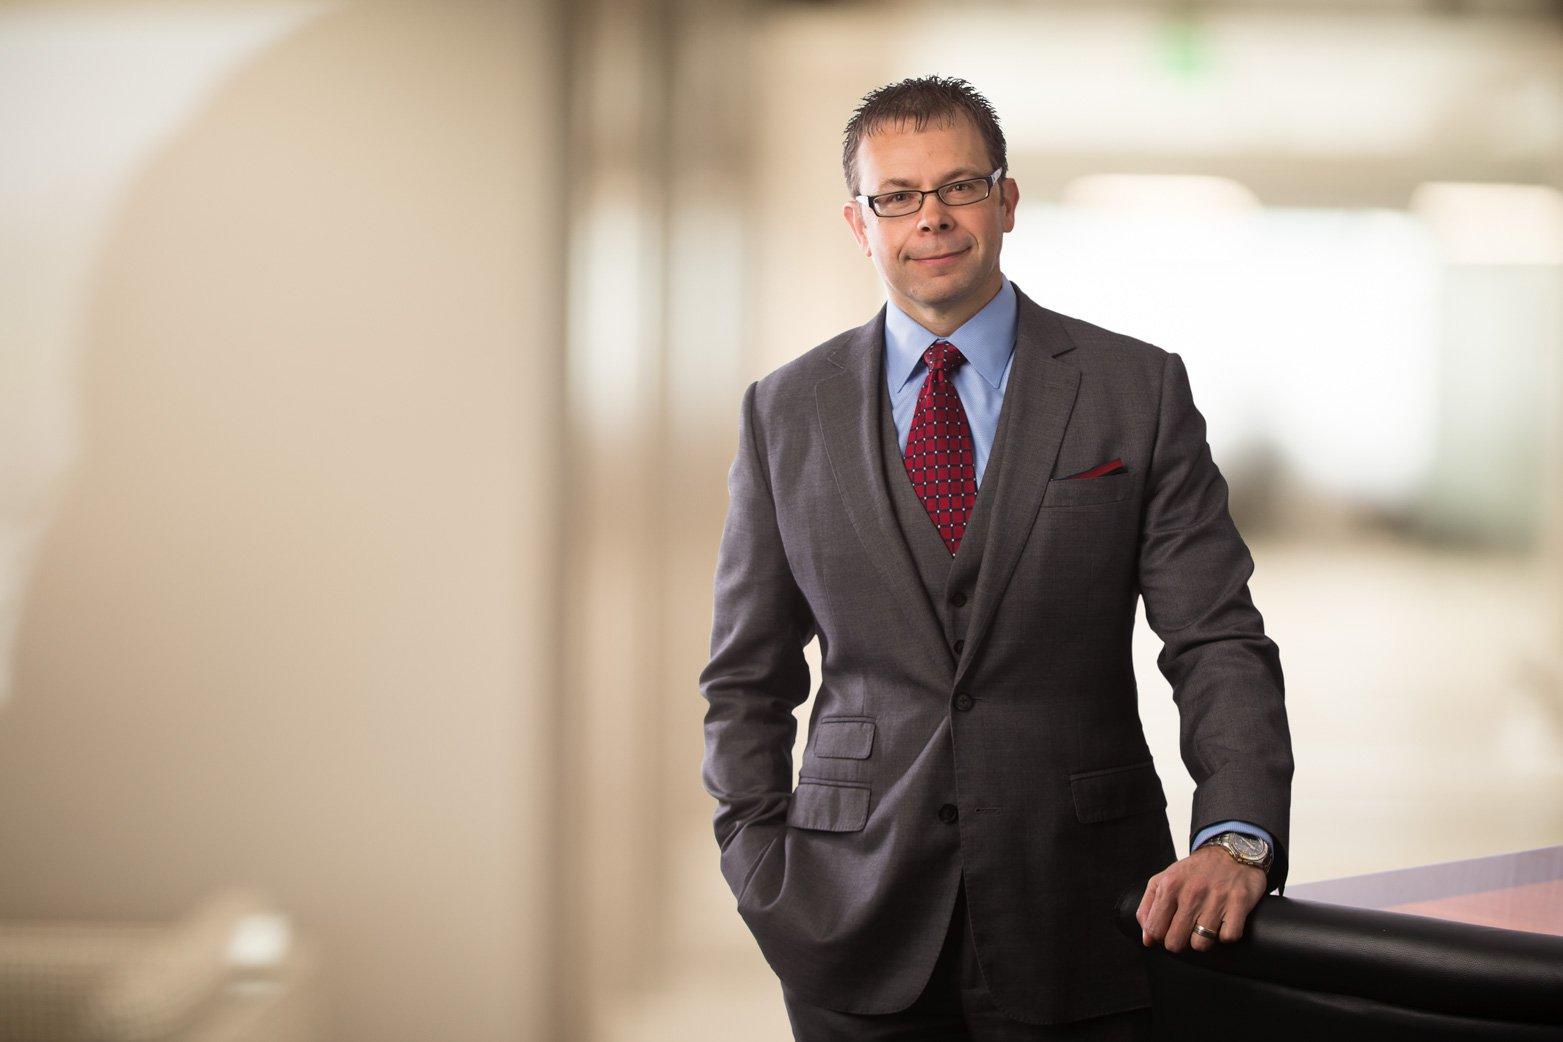 Chad E. Nydegger